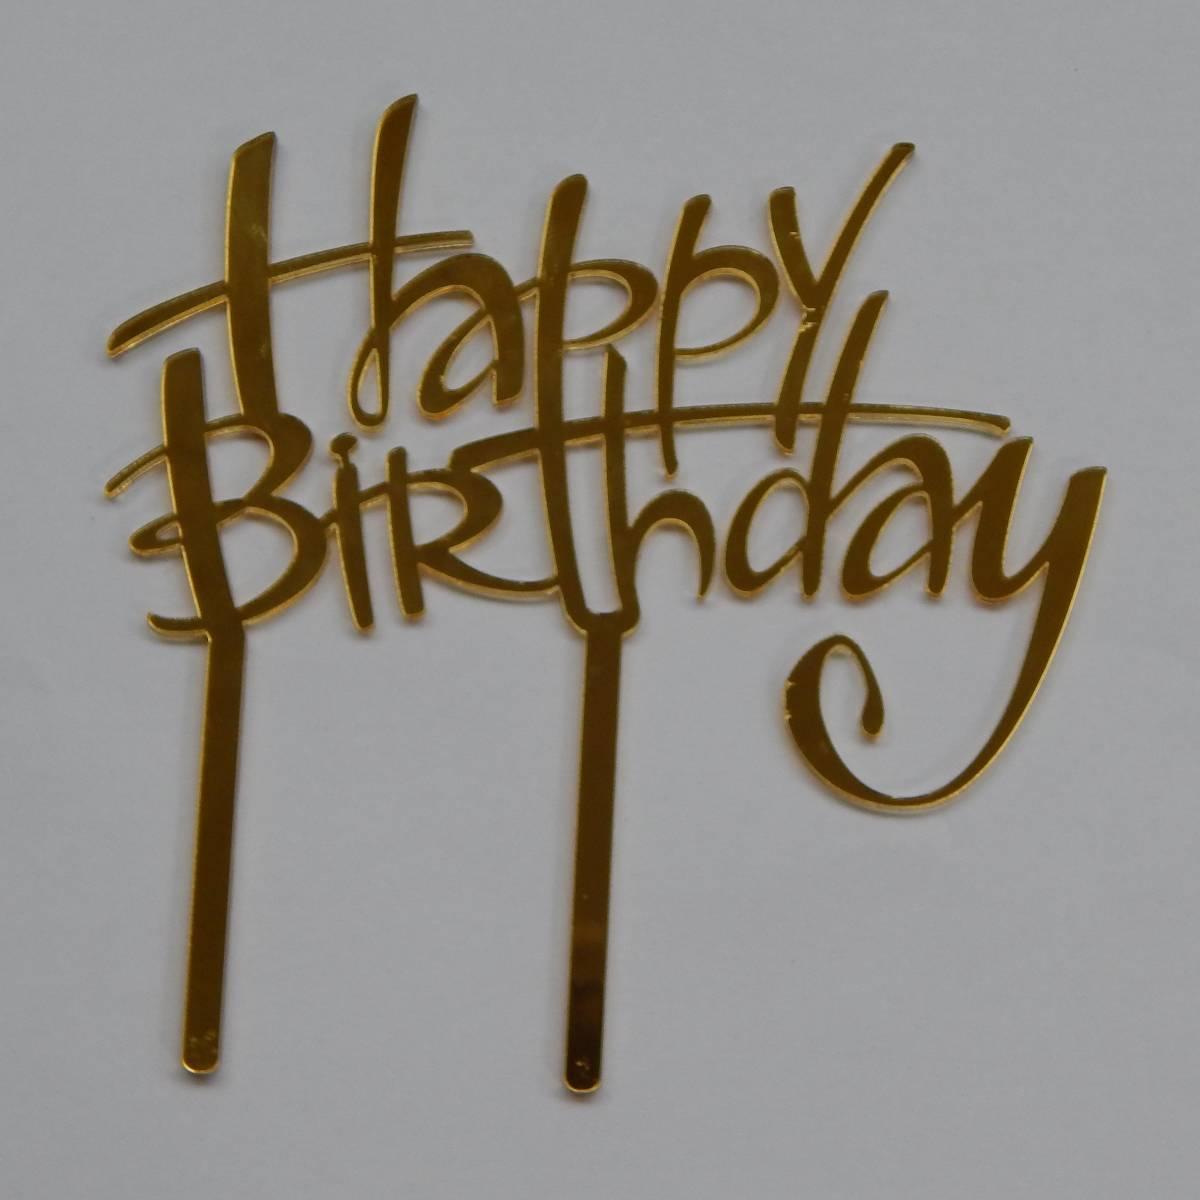 HAPPY BIRTHDAY TOPPER CAKE ACRYLIC  GOLD MIRROR  UFA